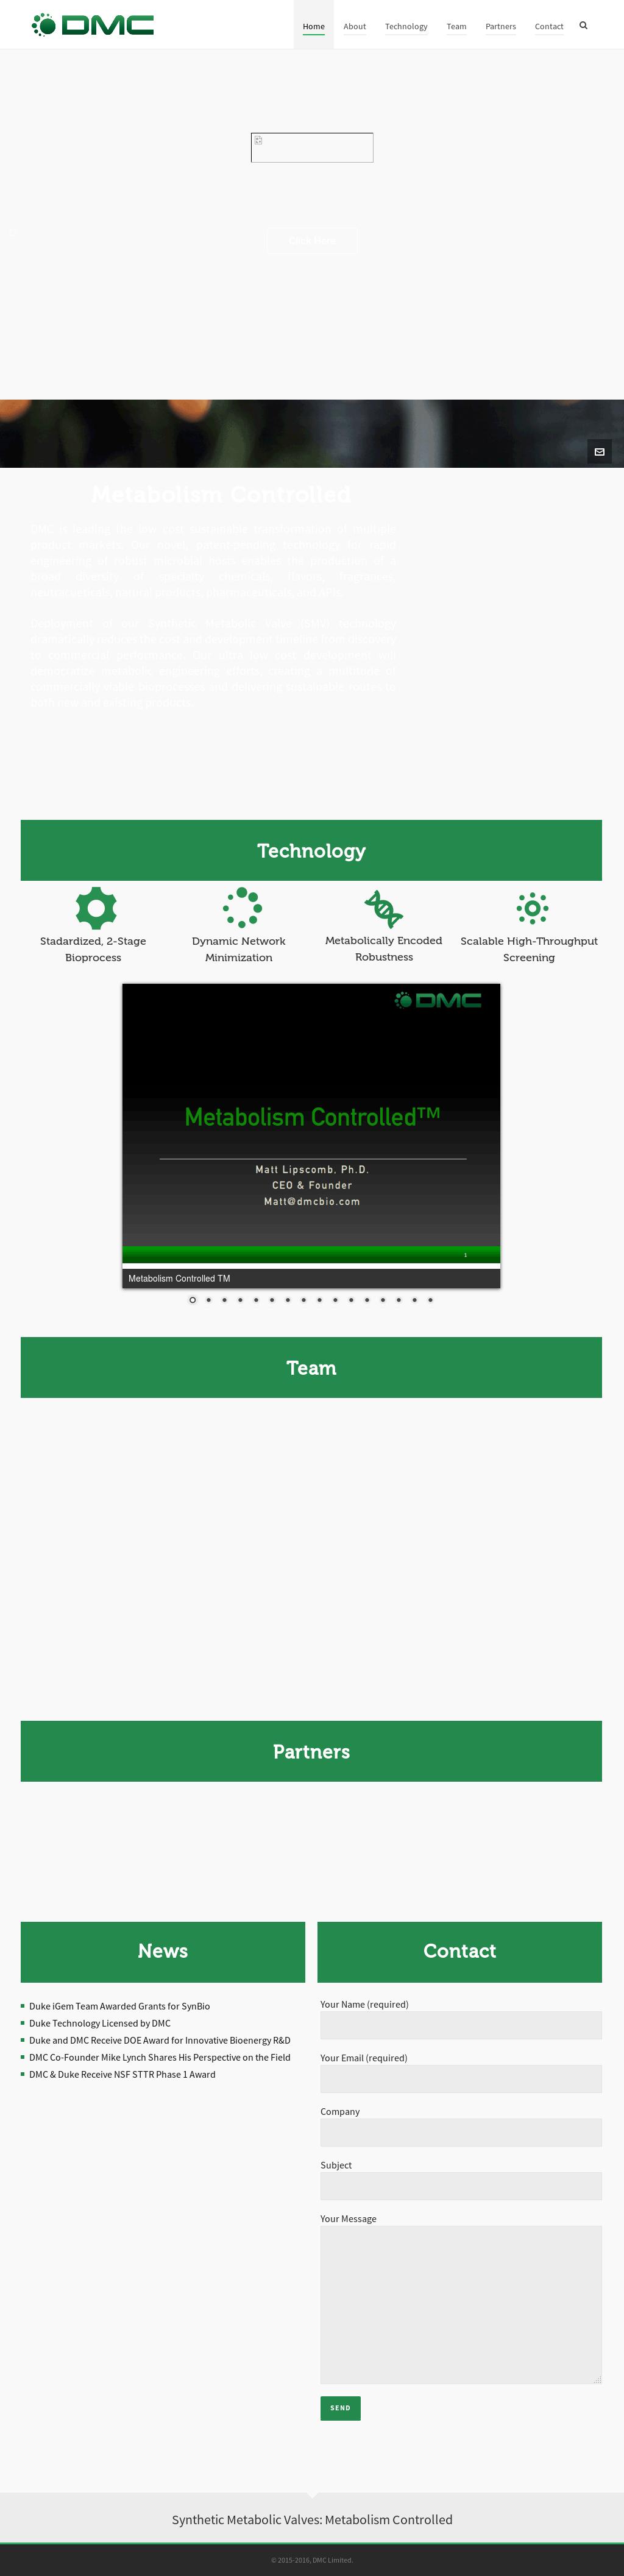 DMC Competitors, Revenue and Employees - Owler Company Profile